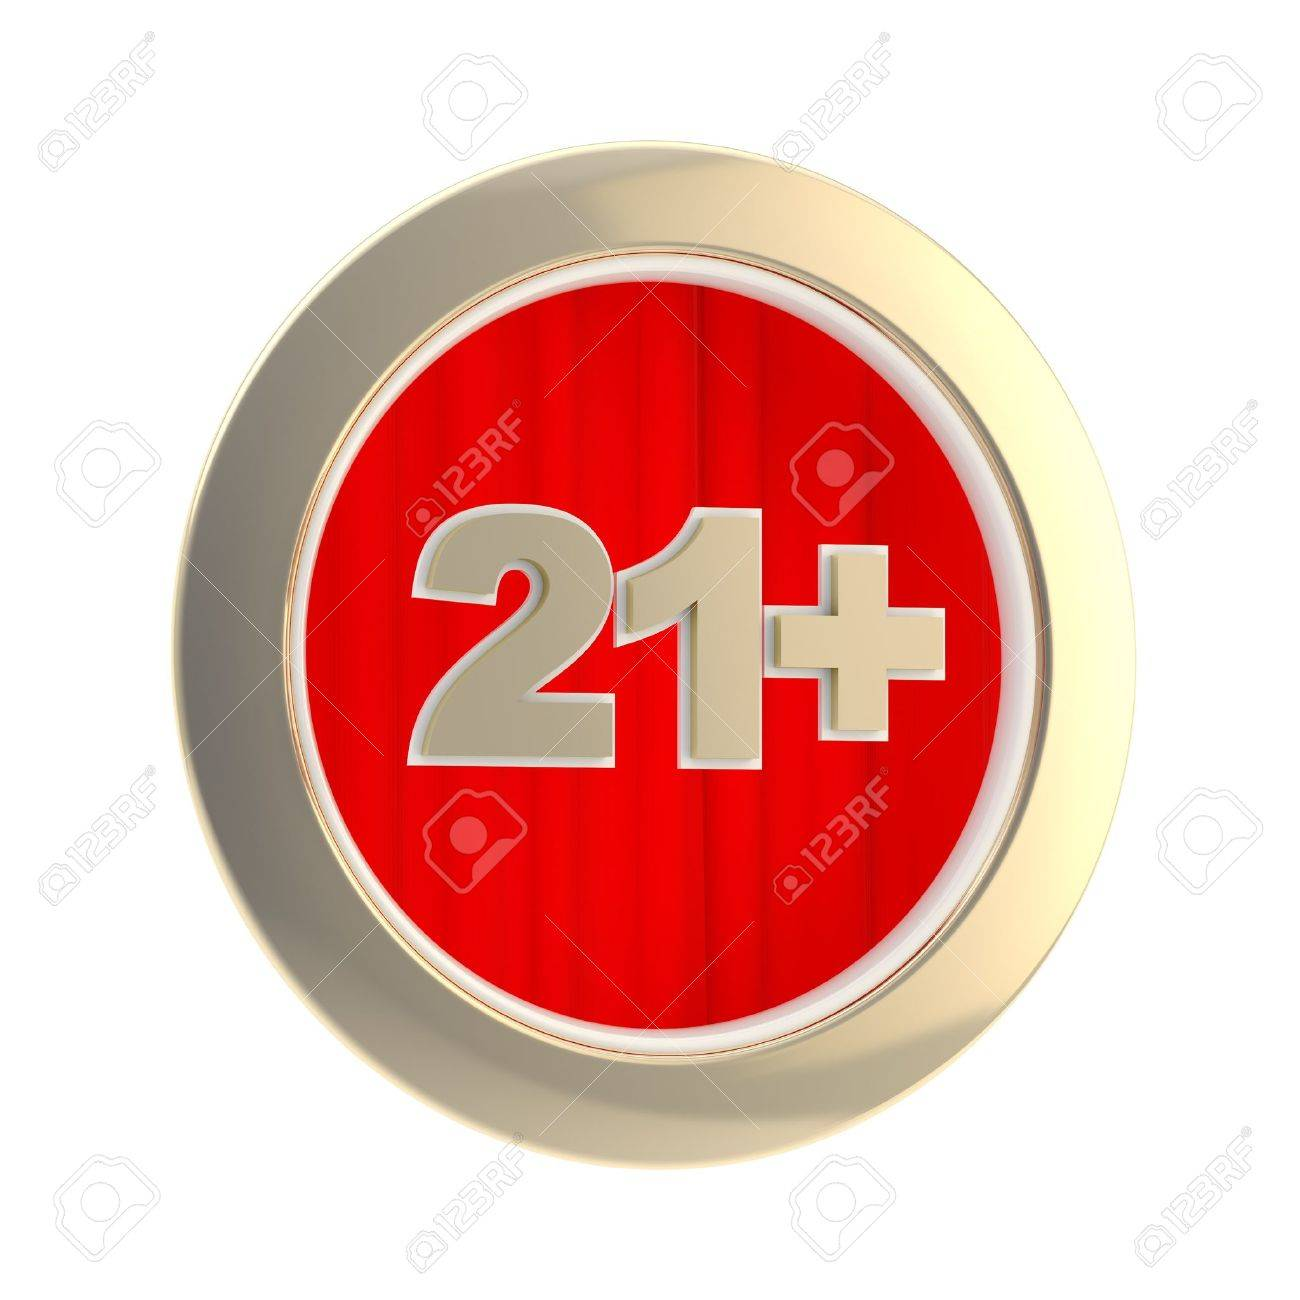 Age limit  21   round symbol isolated Stock Photo - 13228559